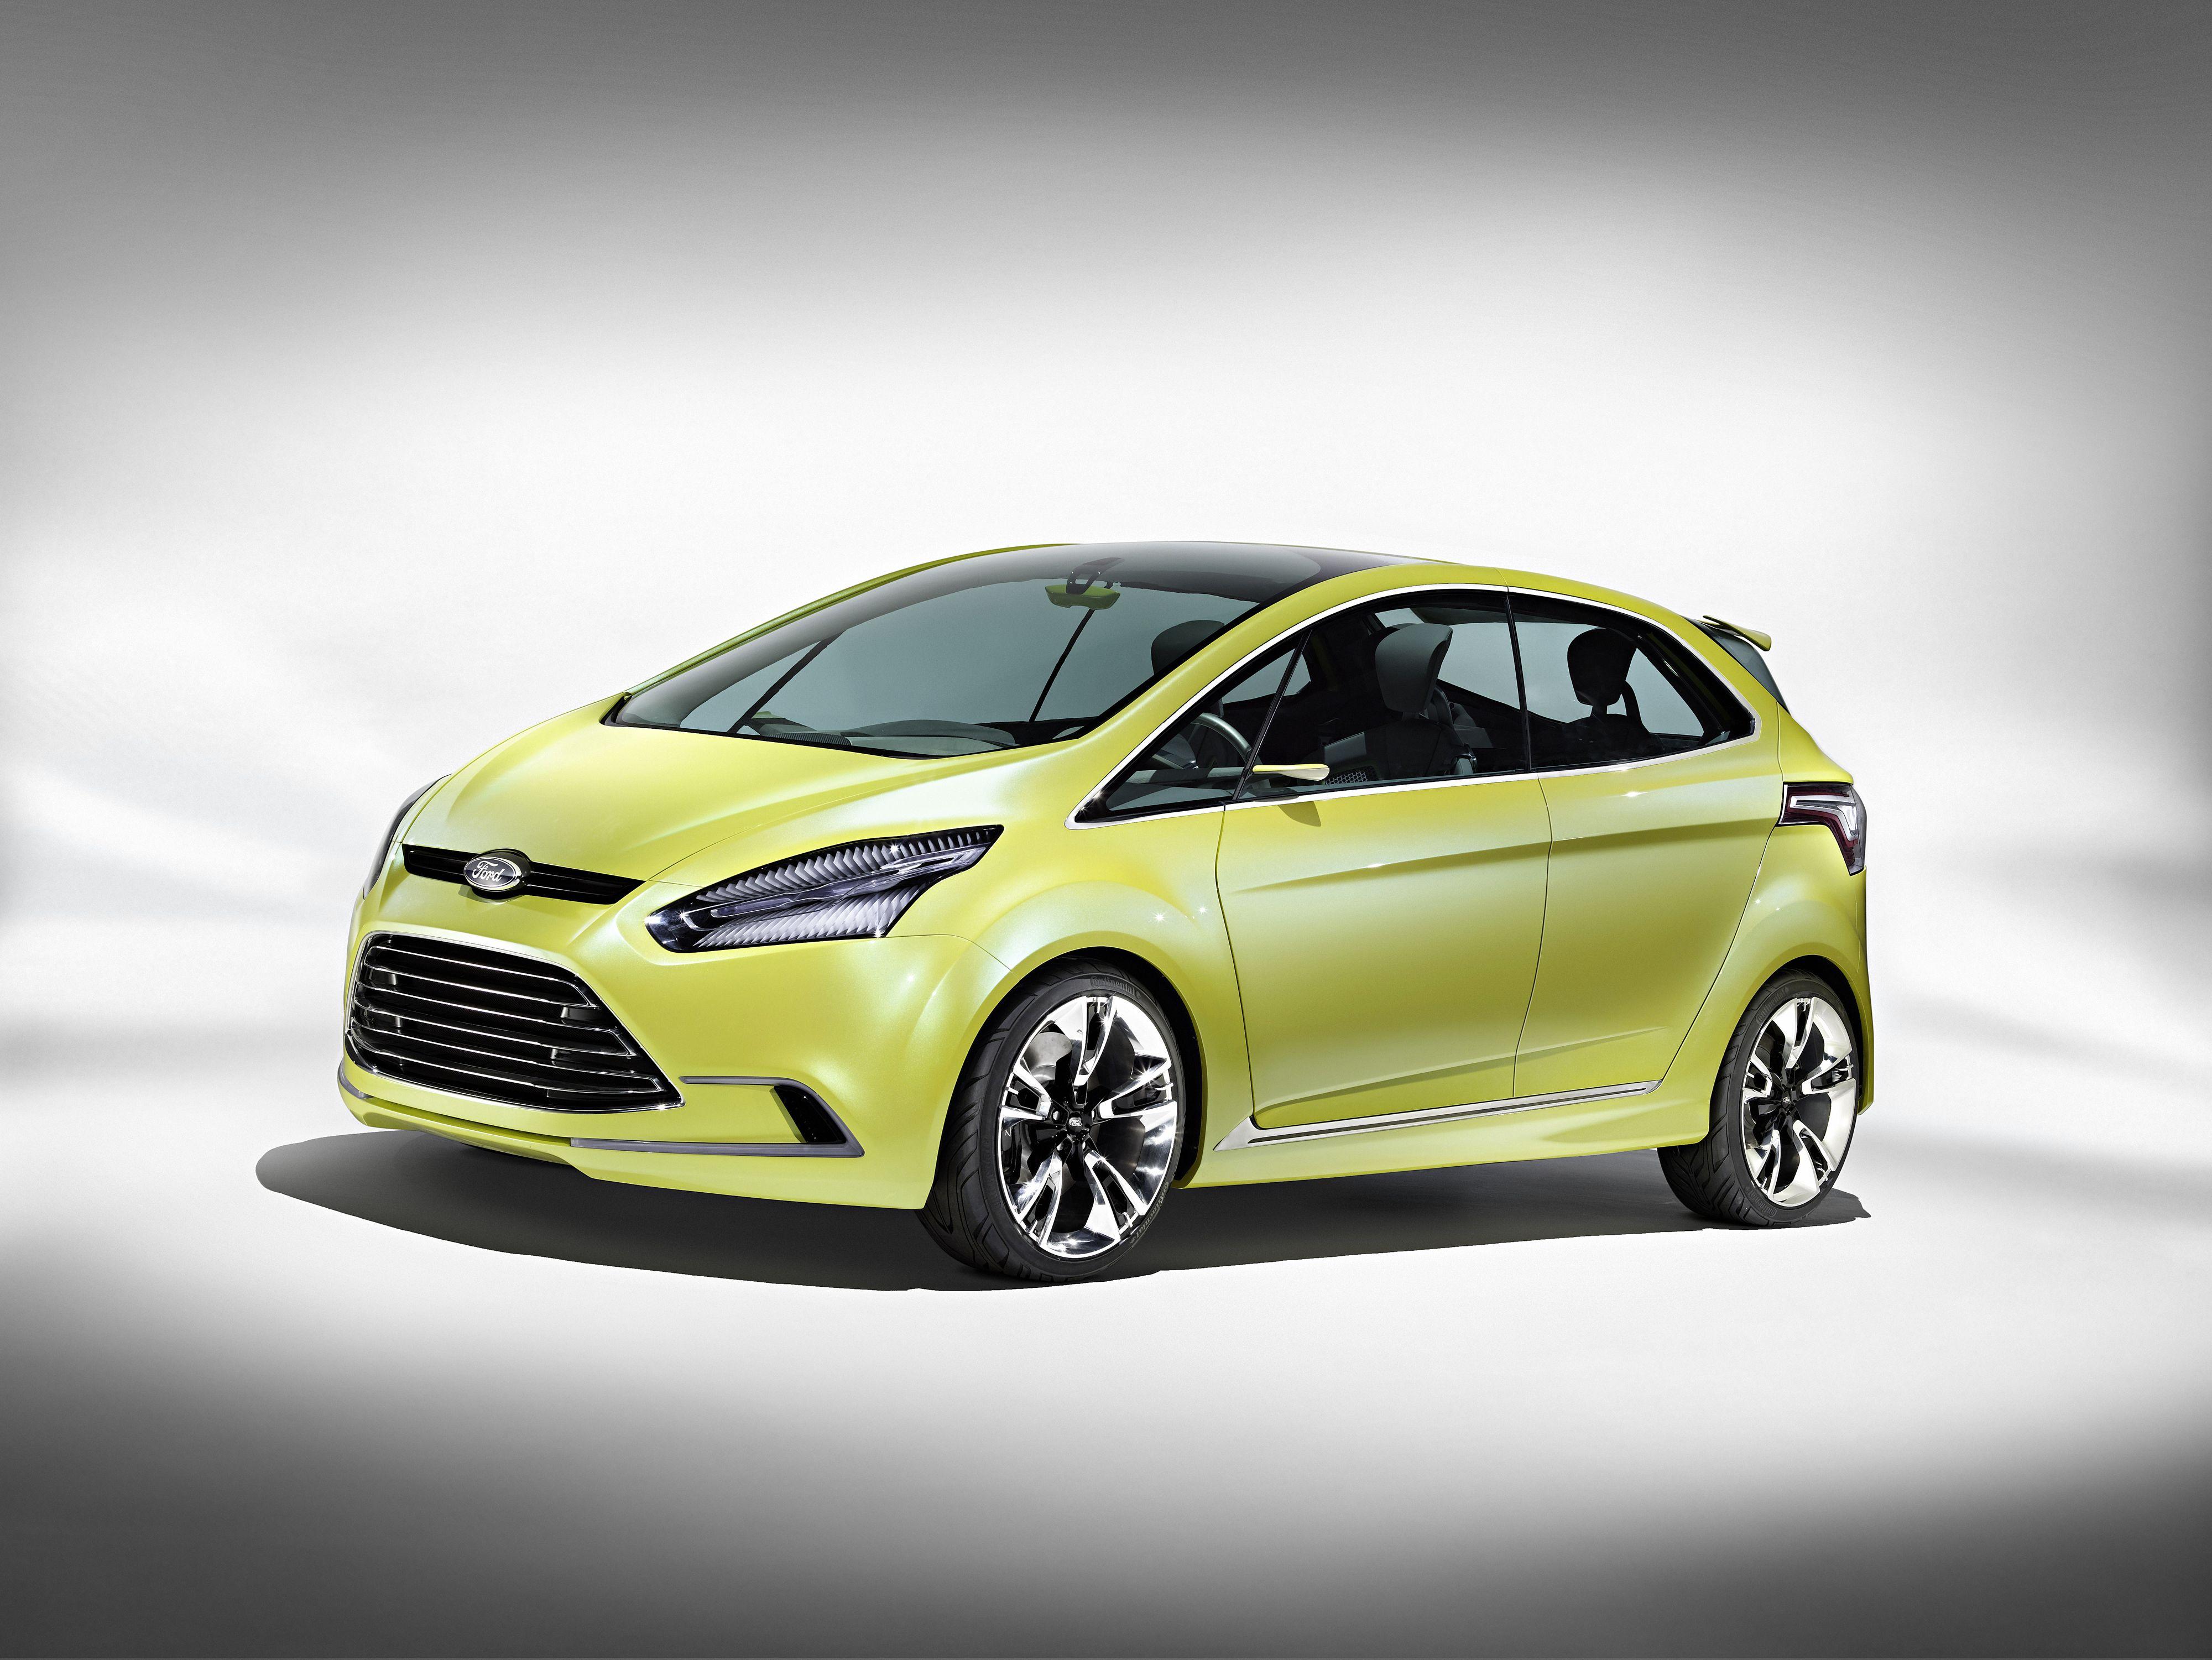 Ford Focus 1.4 16V Trend